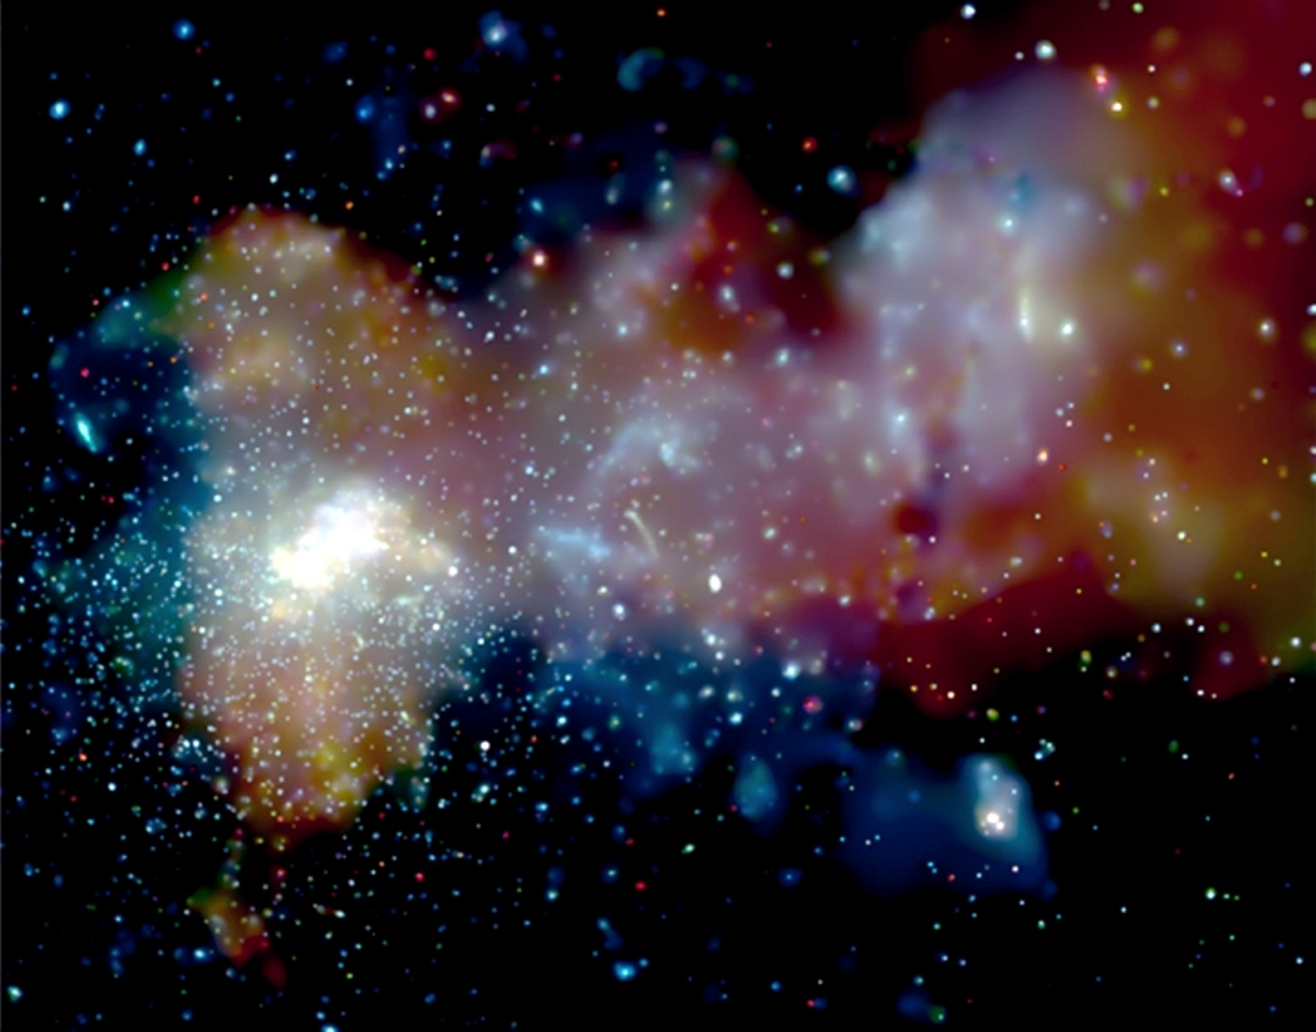 milky way galaxy live wallpaper - photo #5